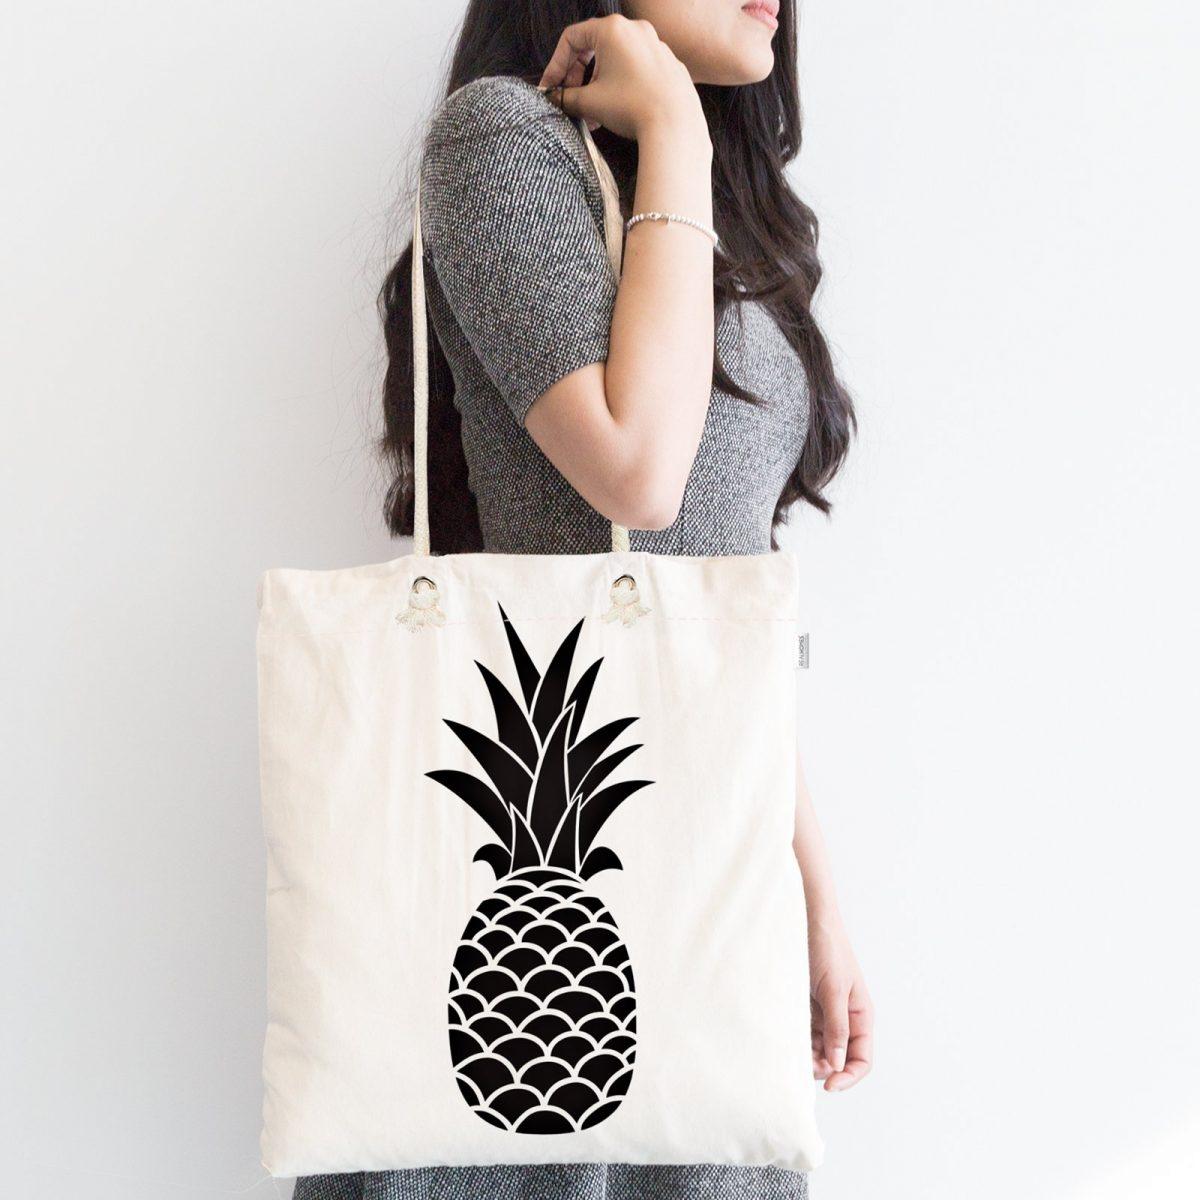 Siyah Beyaz Ananas Baskılı Fermuarlı Modern Kumaş Çanta Realhomes